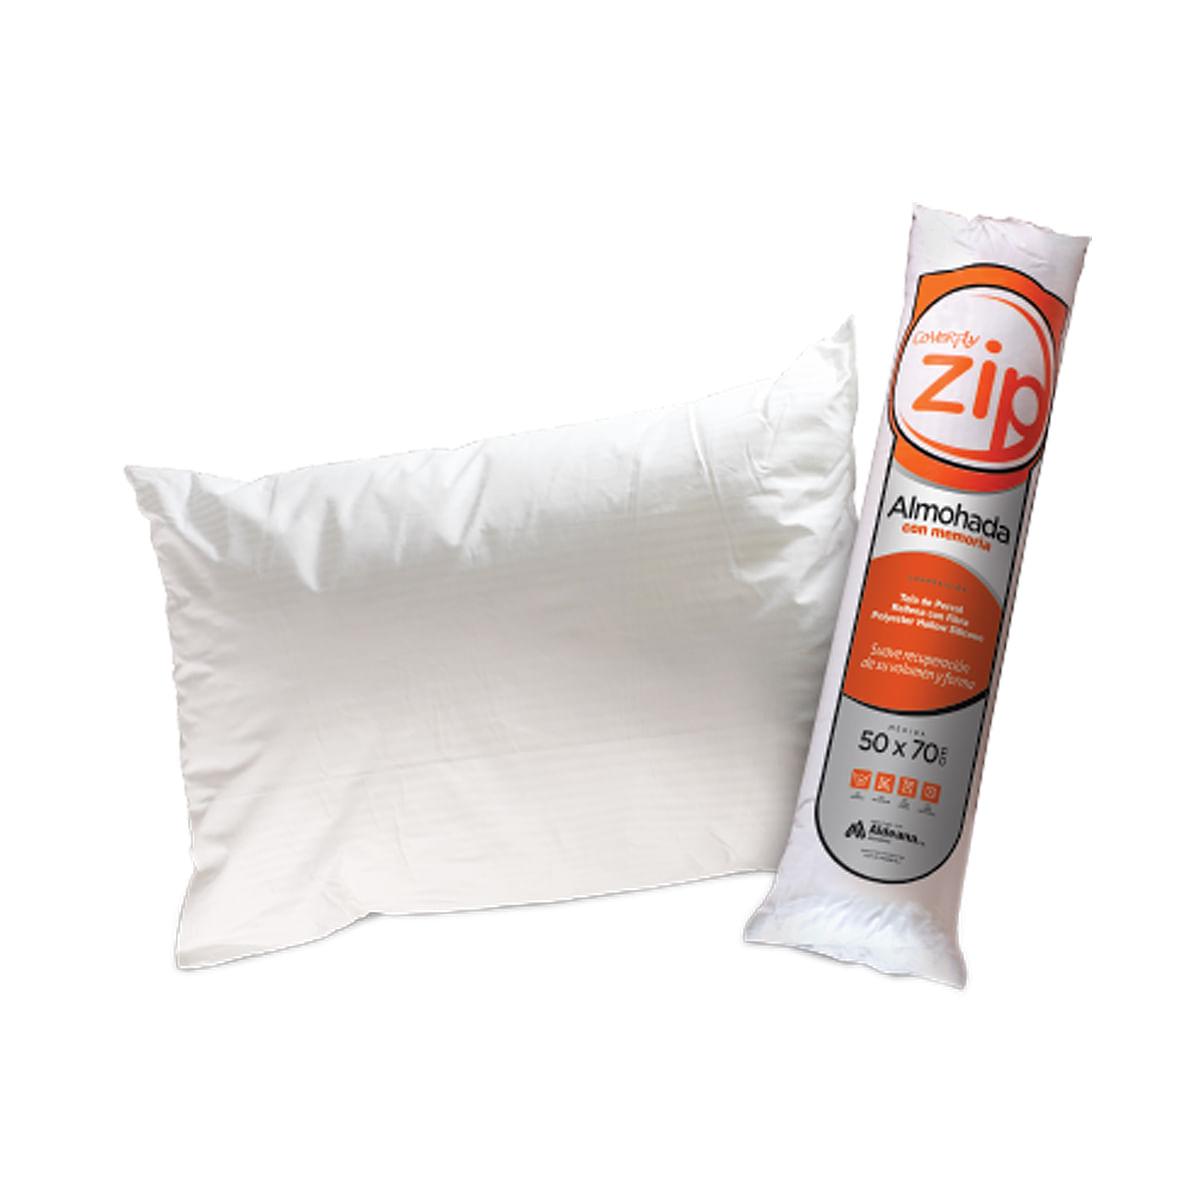 almohada-zip-comprimida